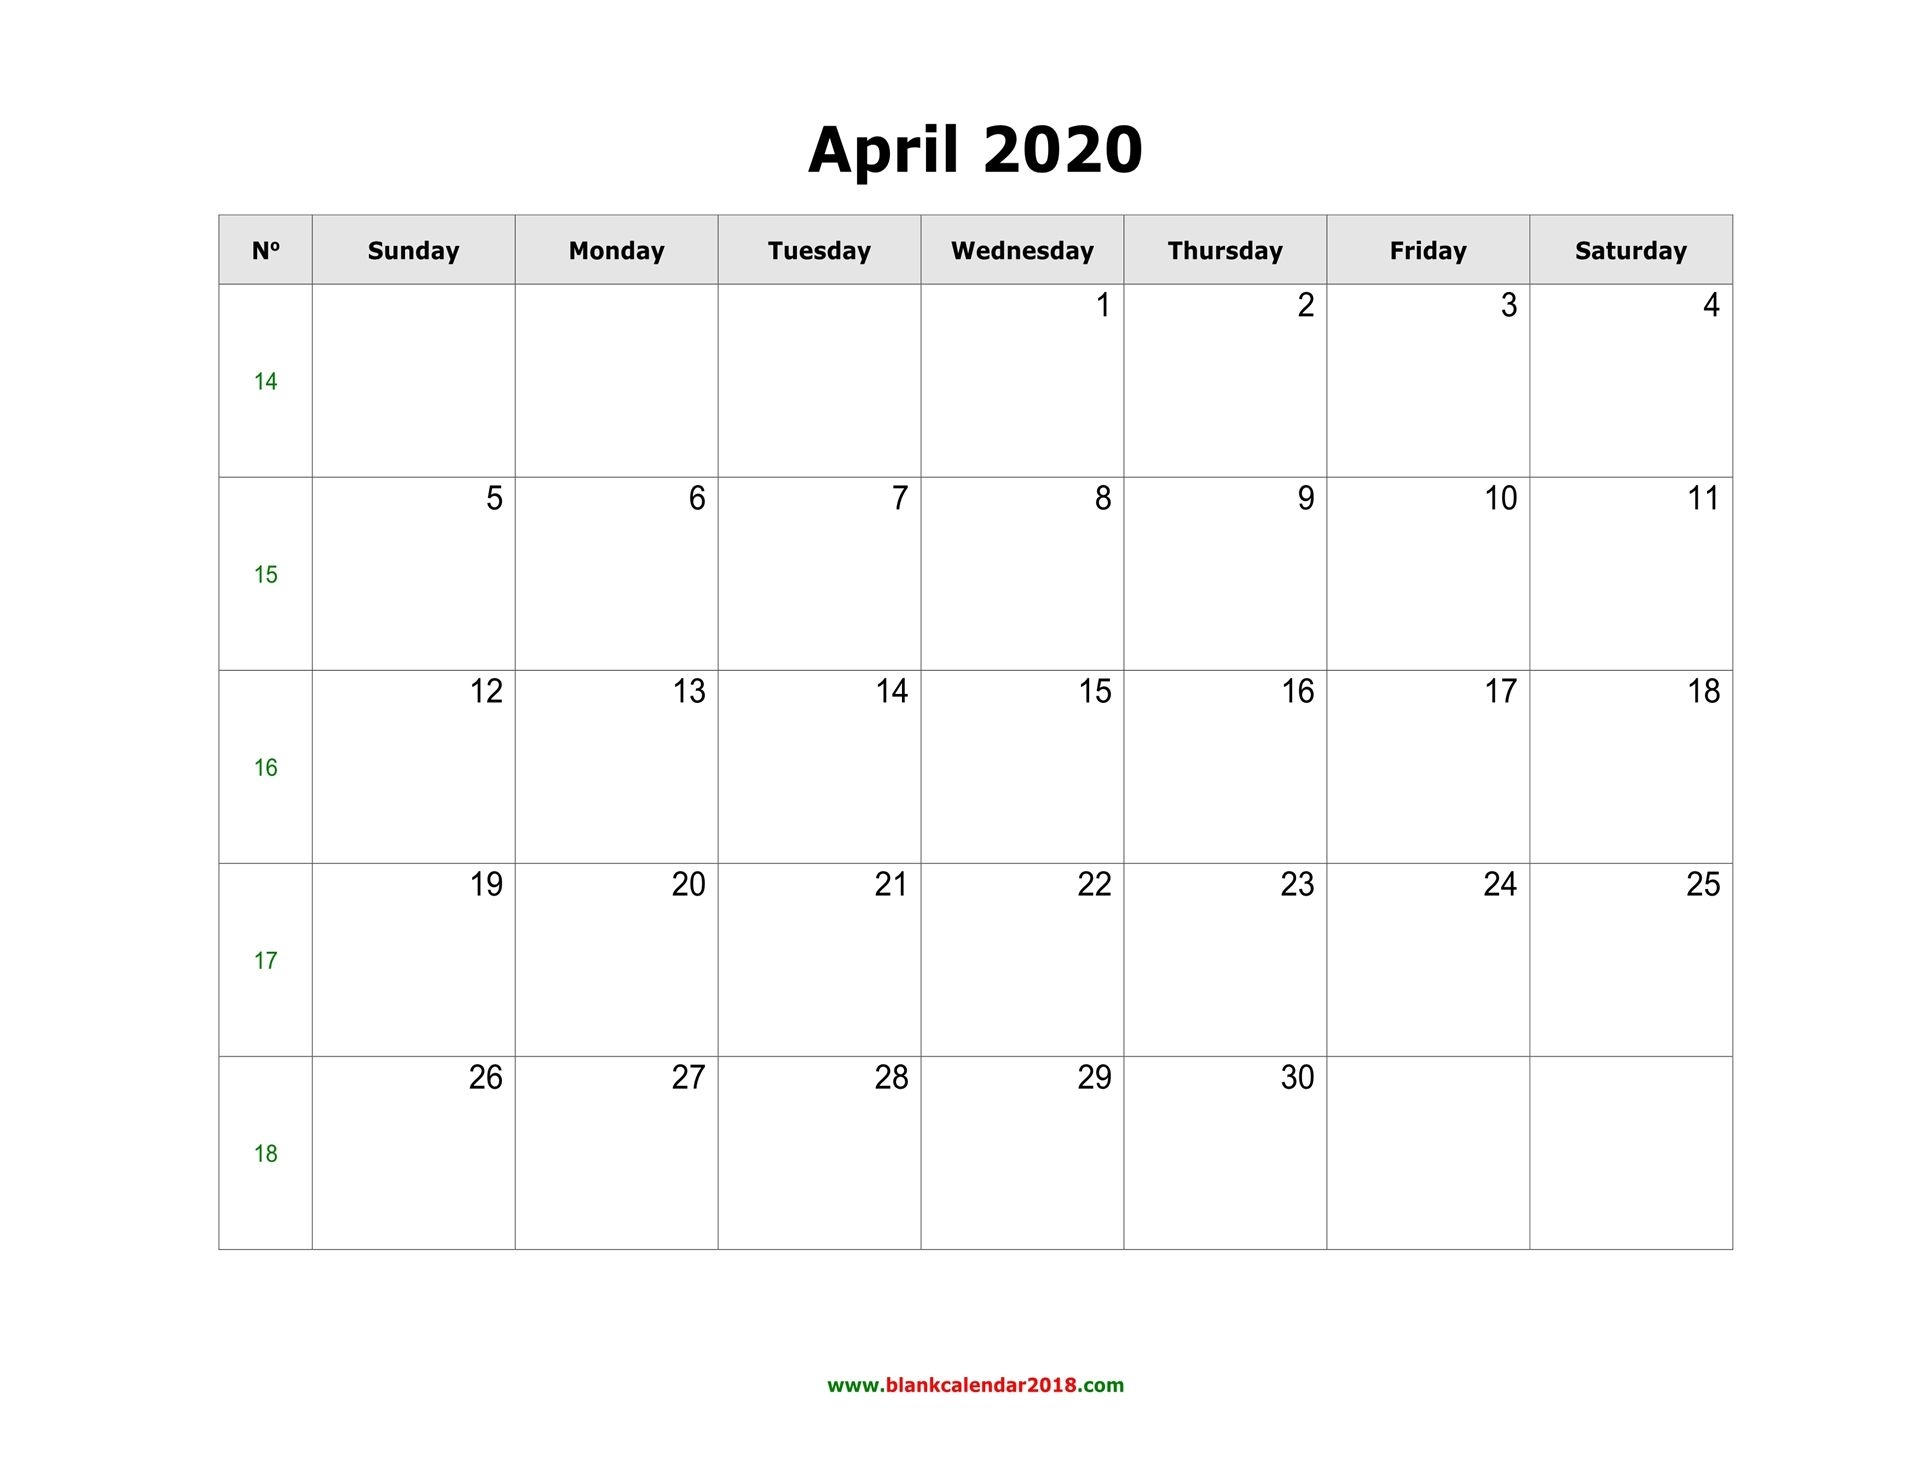 Blank Calendar For April 2020